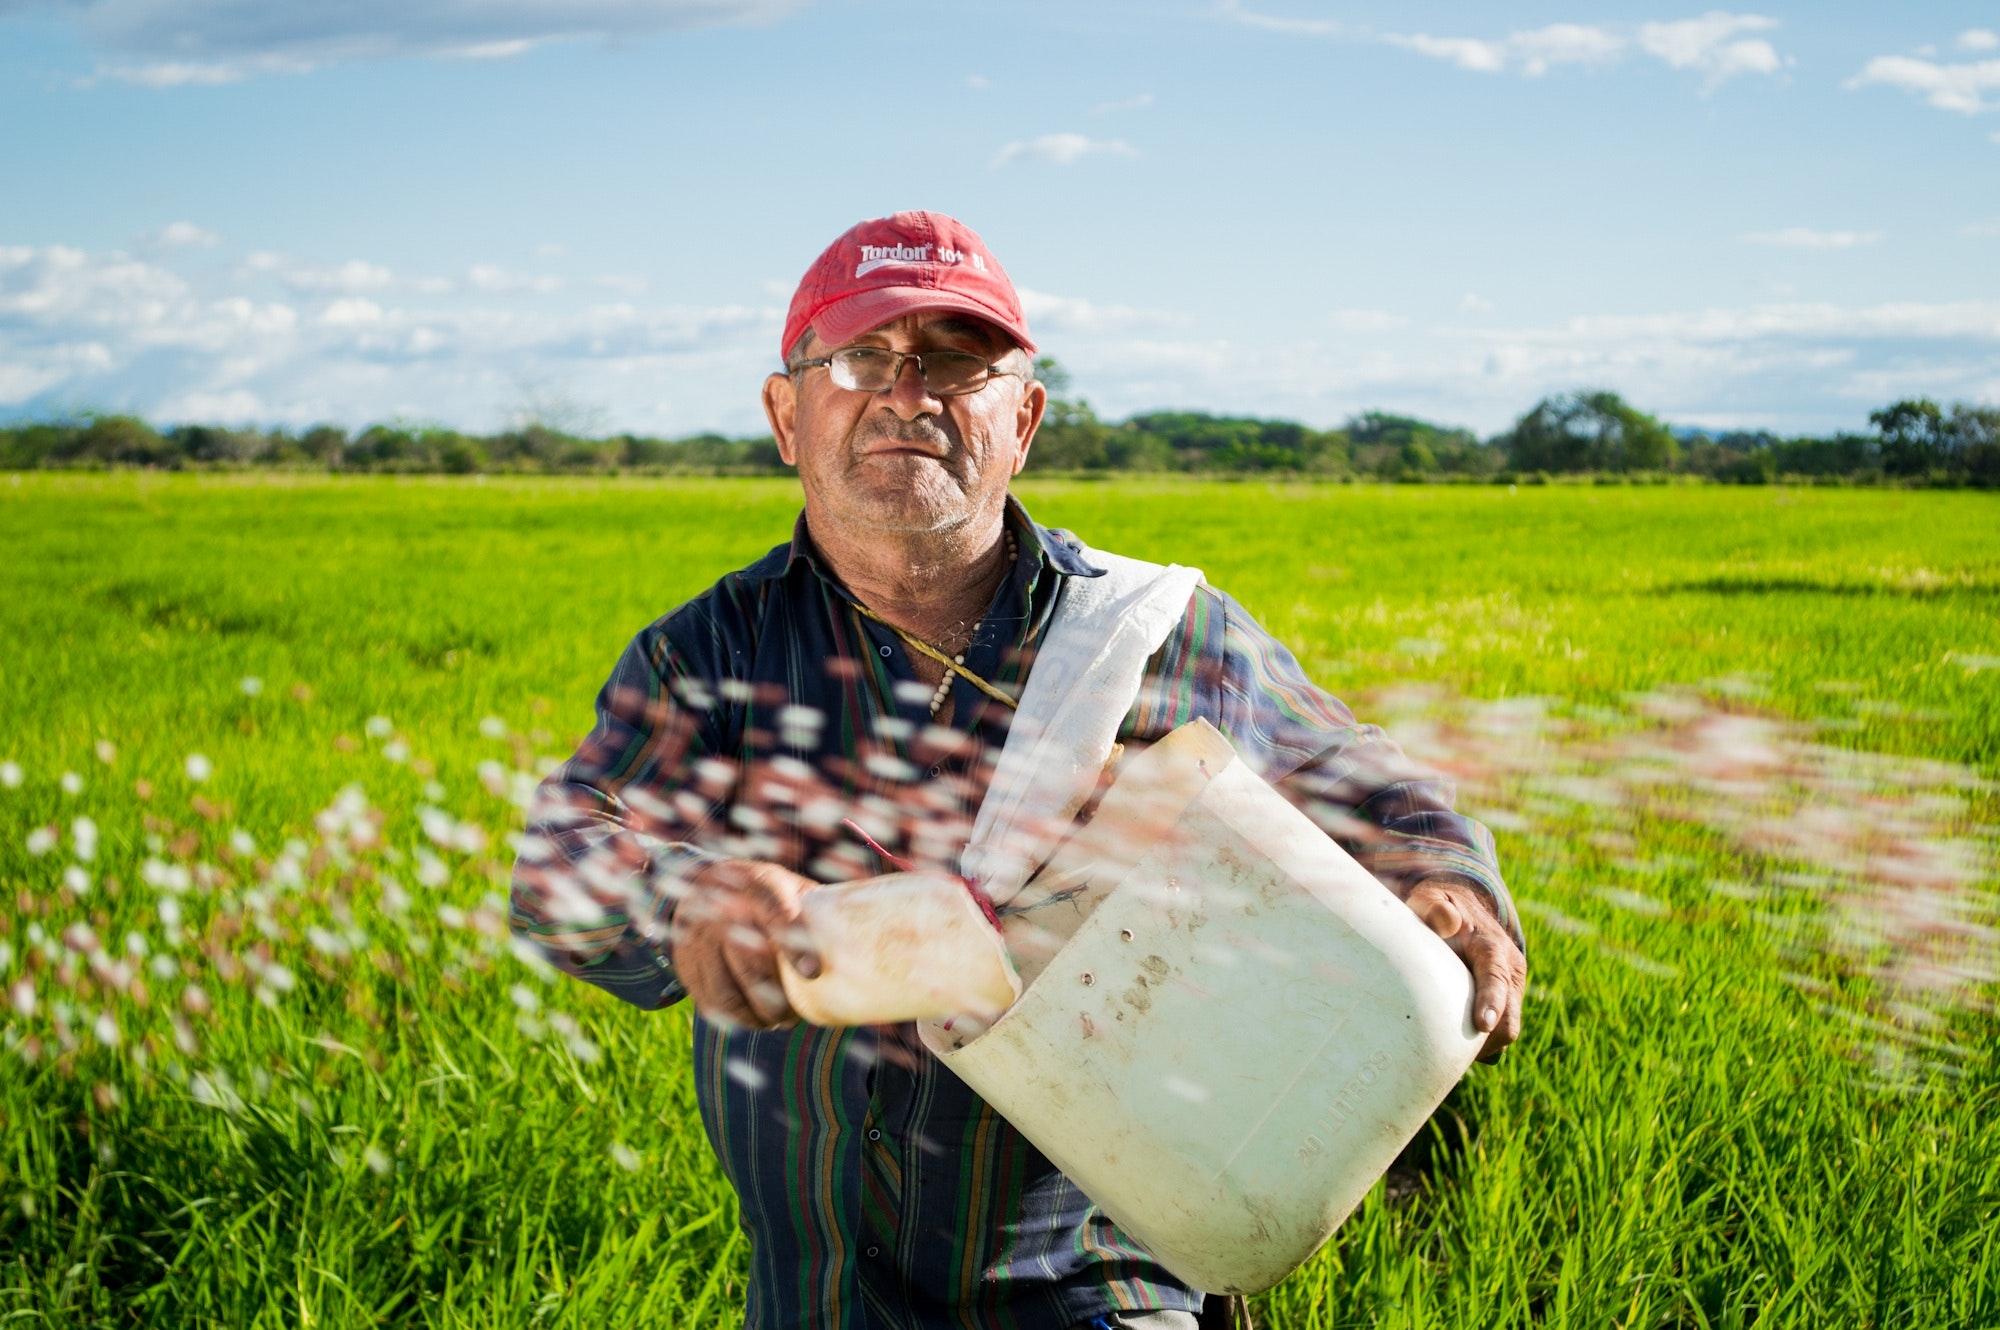 countryside-farm-farmer-50715.jpg